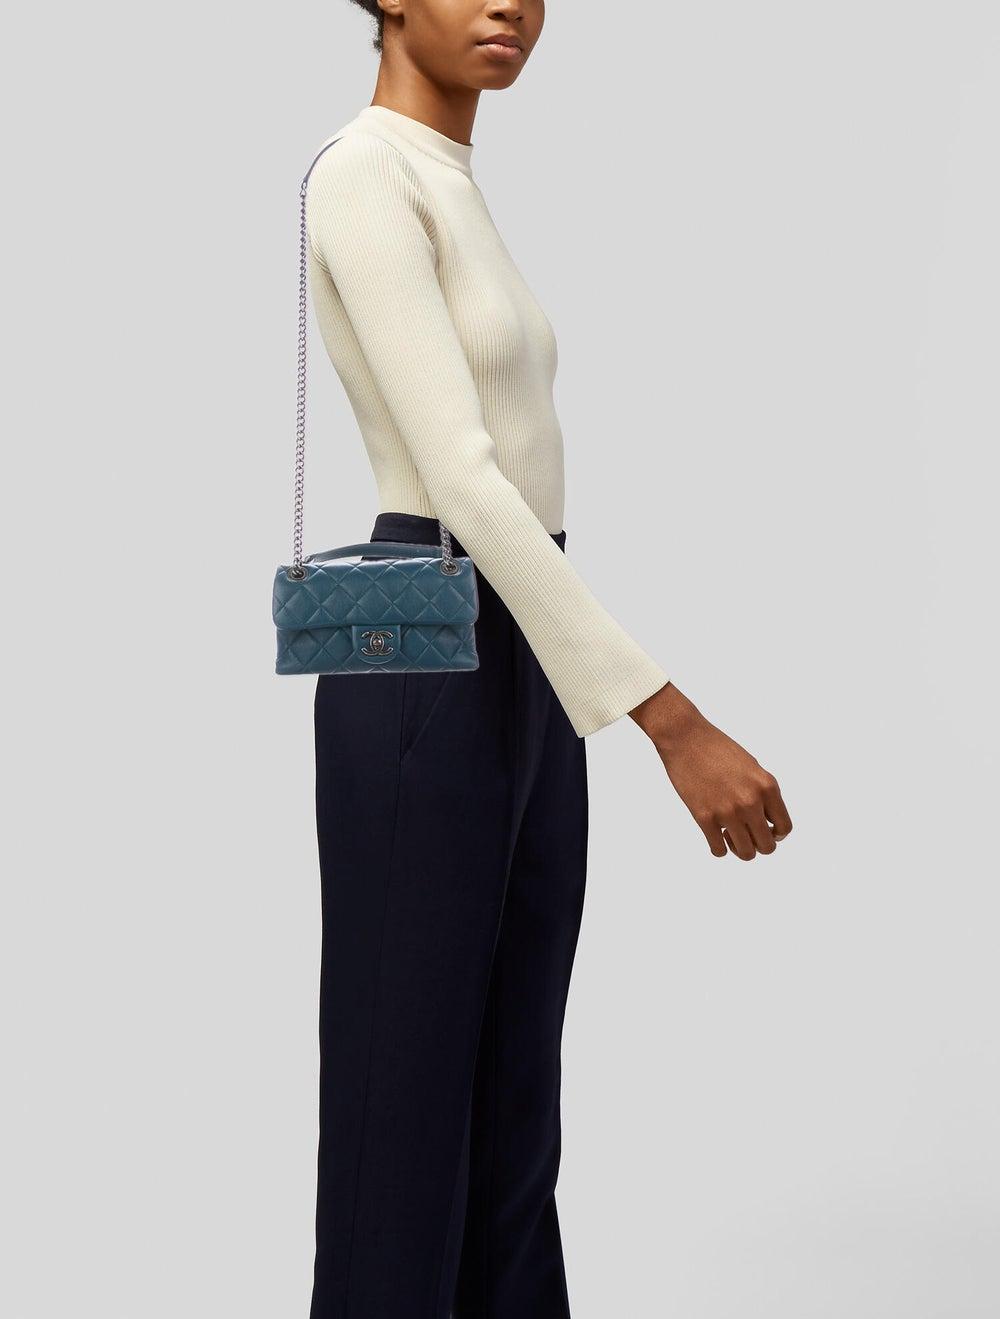 Chanel Small Burgundy Rocks Flap Bag Blue - image 2